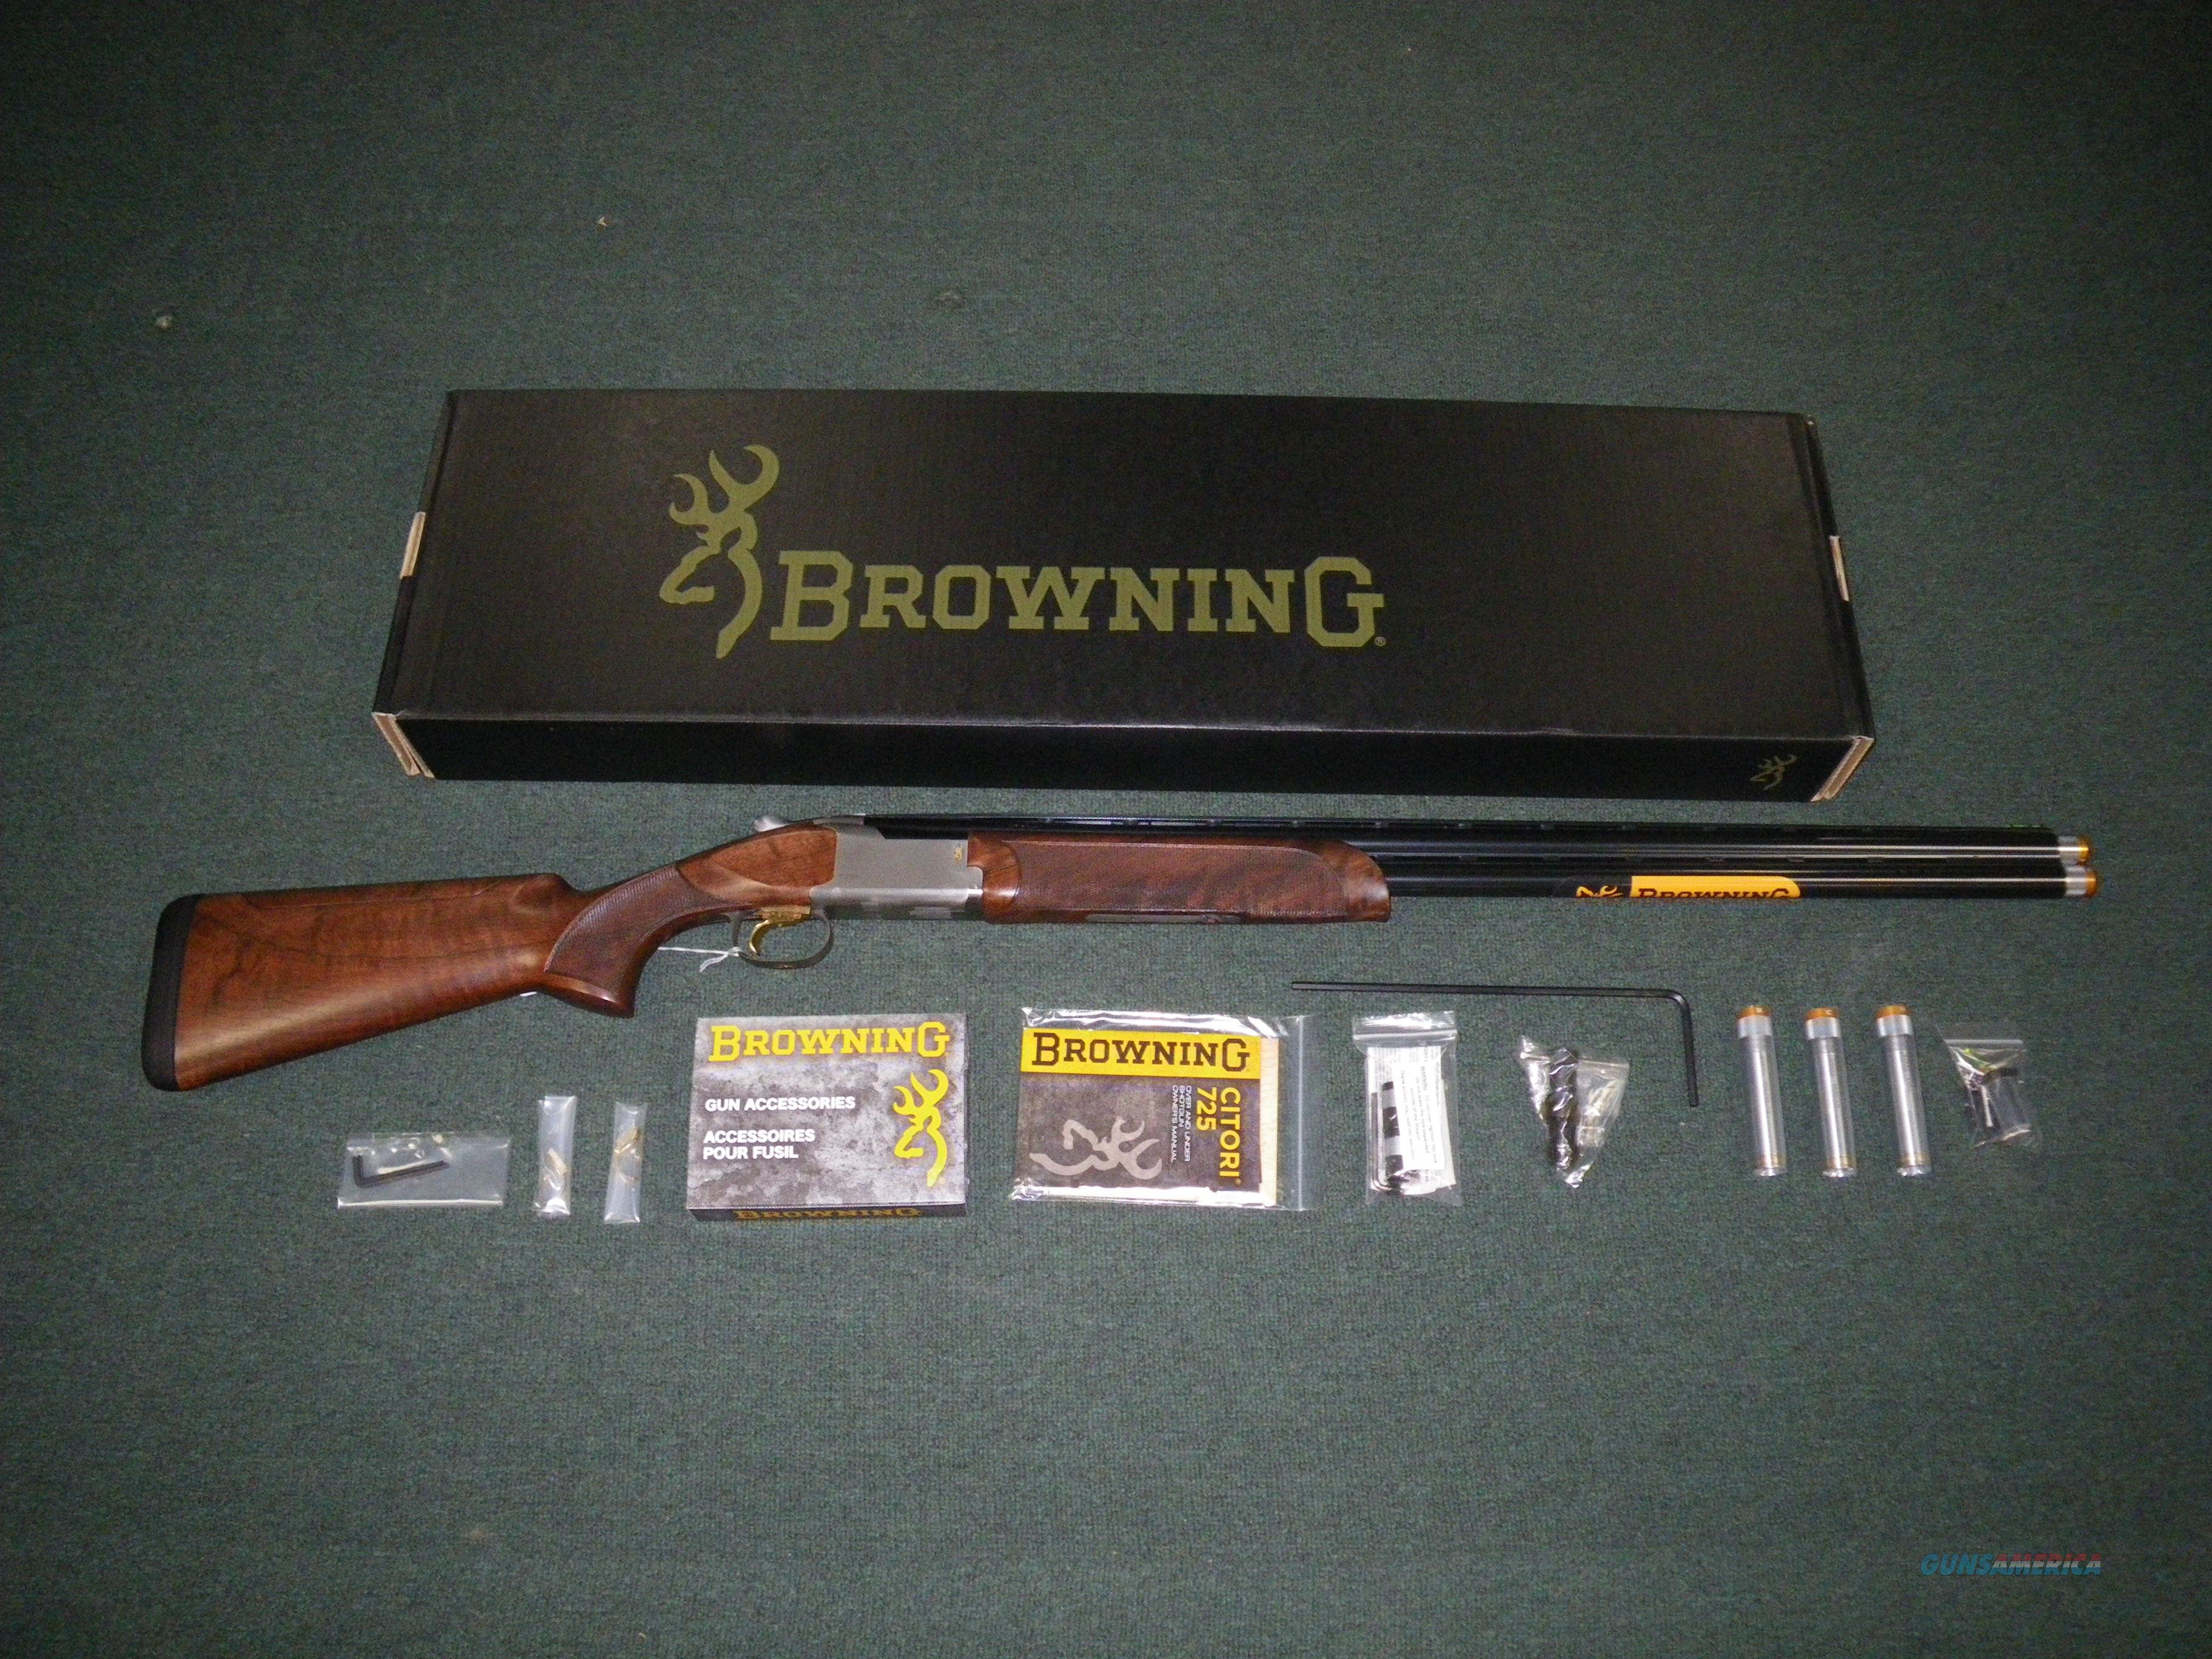 "Browning Citori 725 Sporting 12ga 30"" Adj Comb NEW #0135533010  Guns > Shotguns > Browning Shotguns > Over Unders > Citori > Hunting"